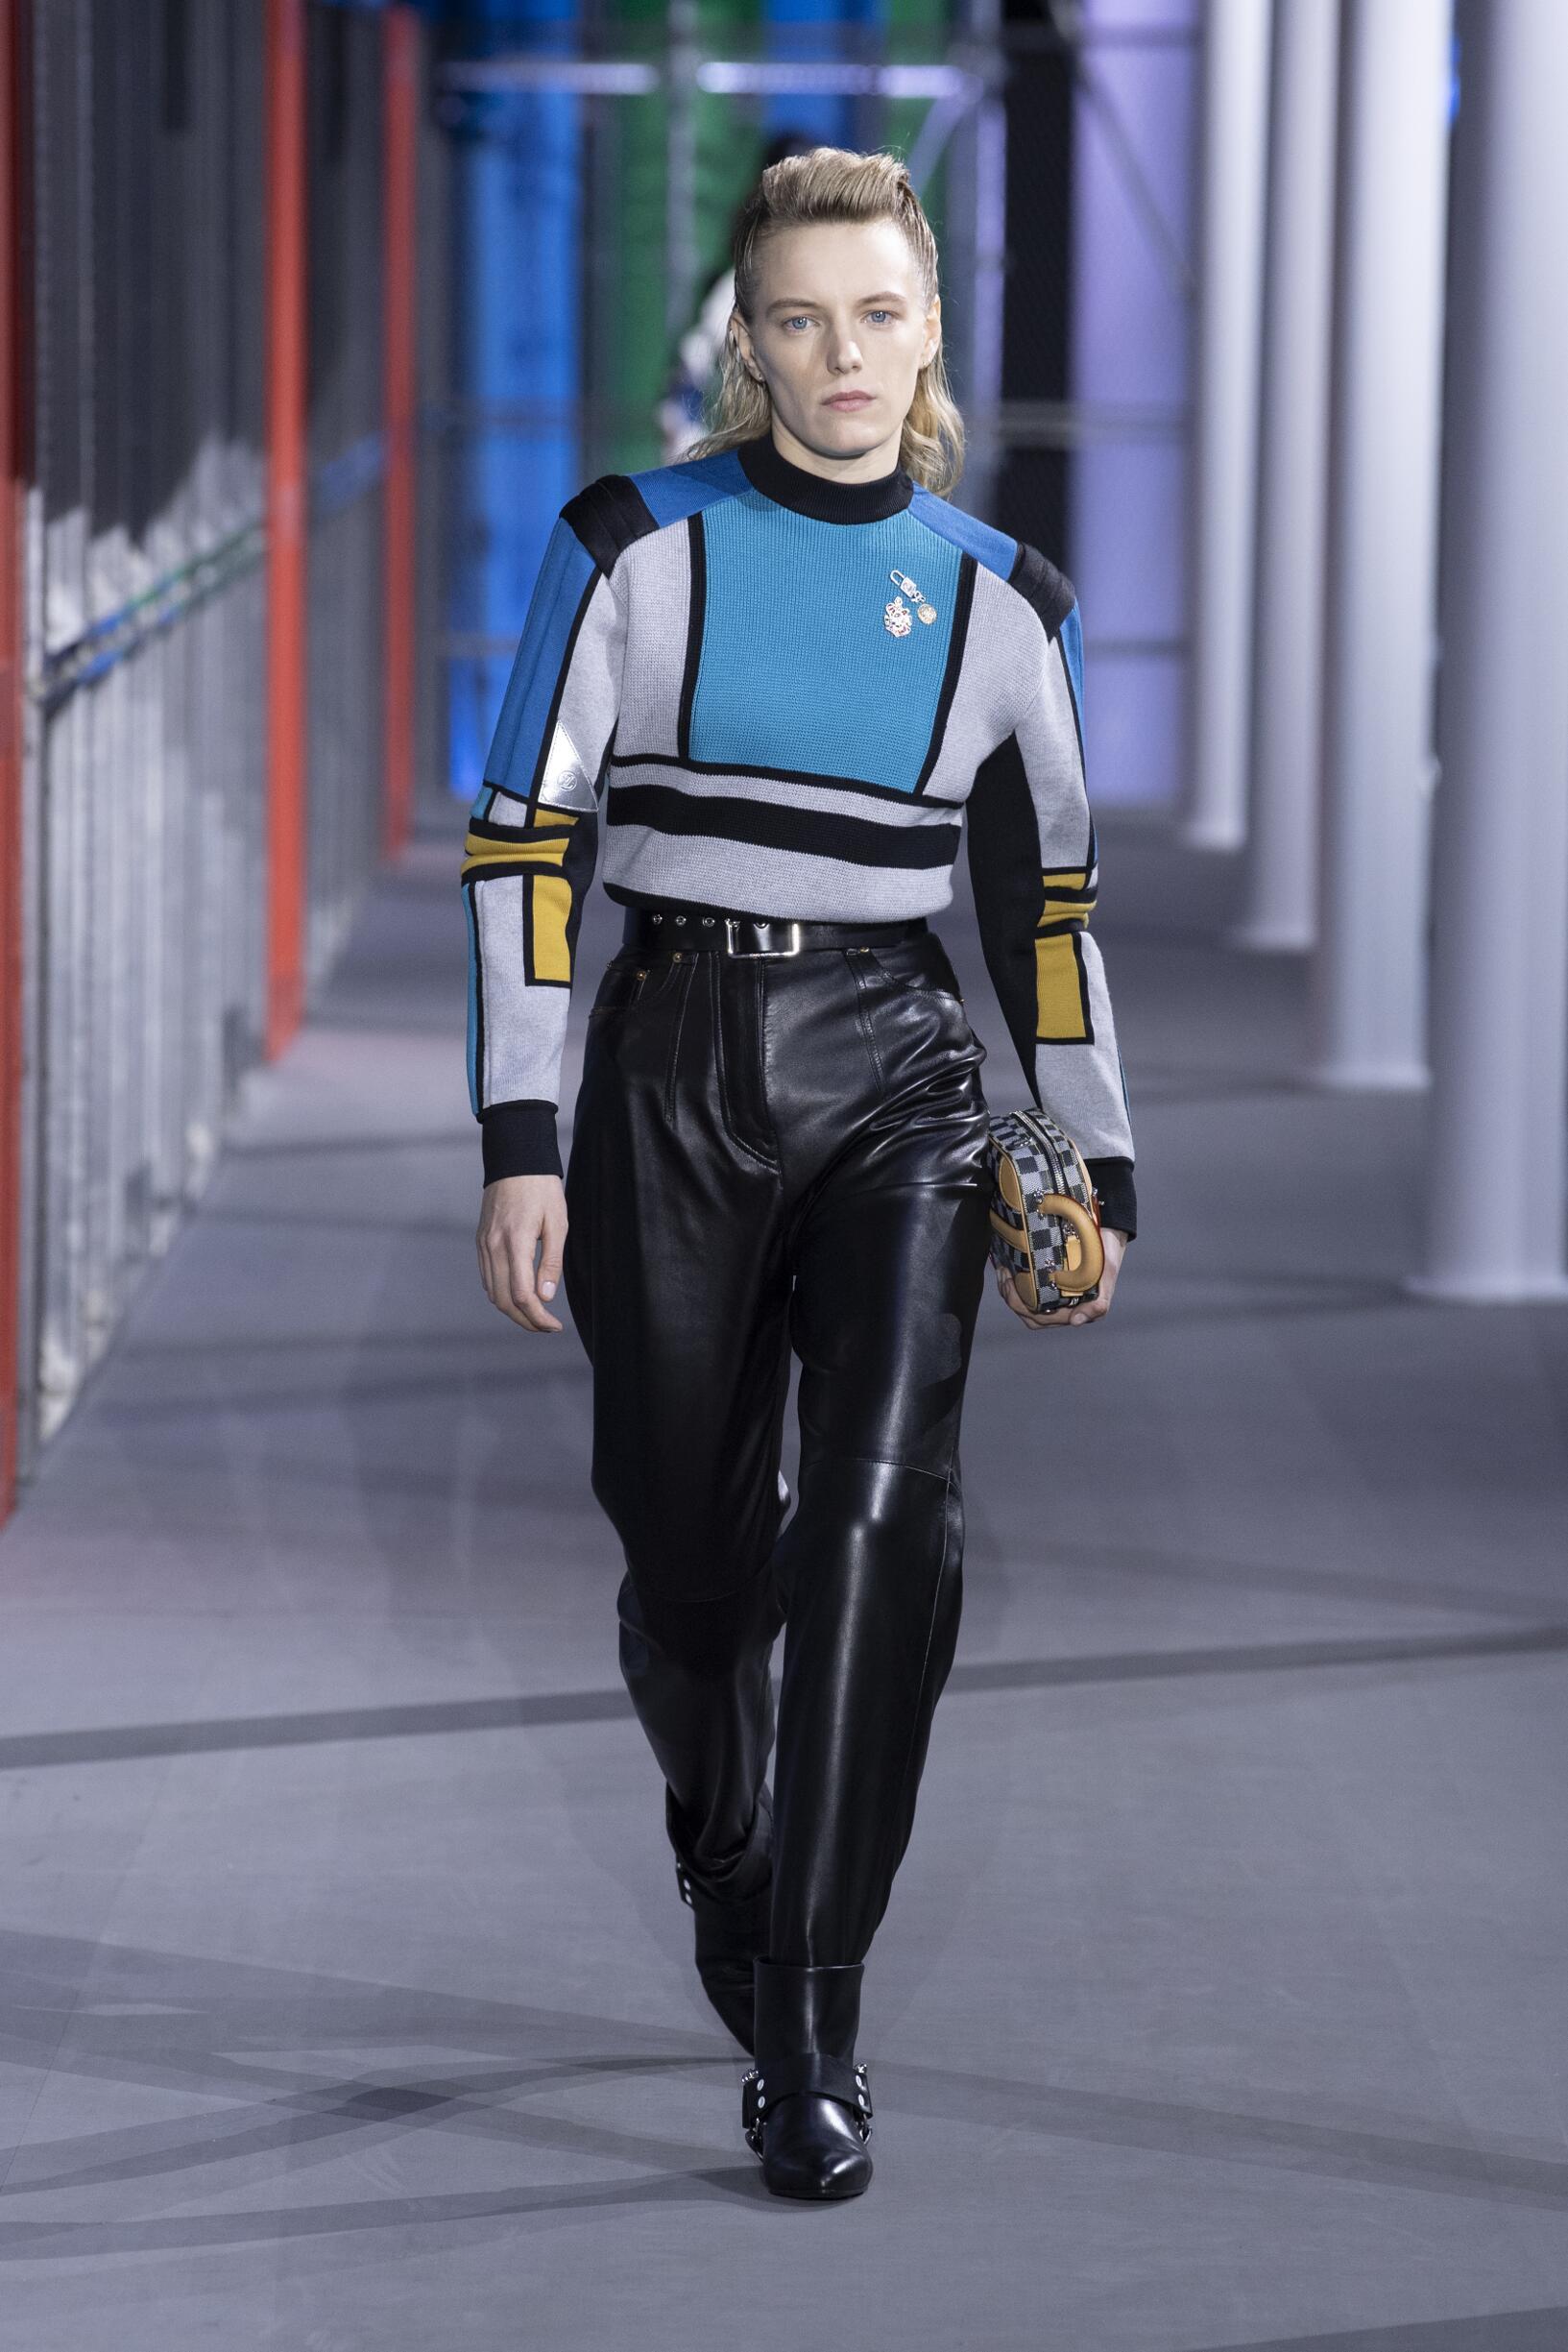 2019 Catwalk Louis Vuitton Woman Fashion Show Winter